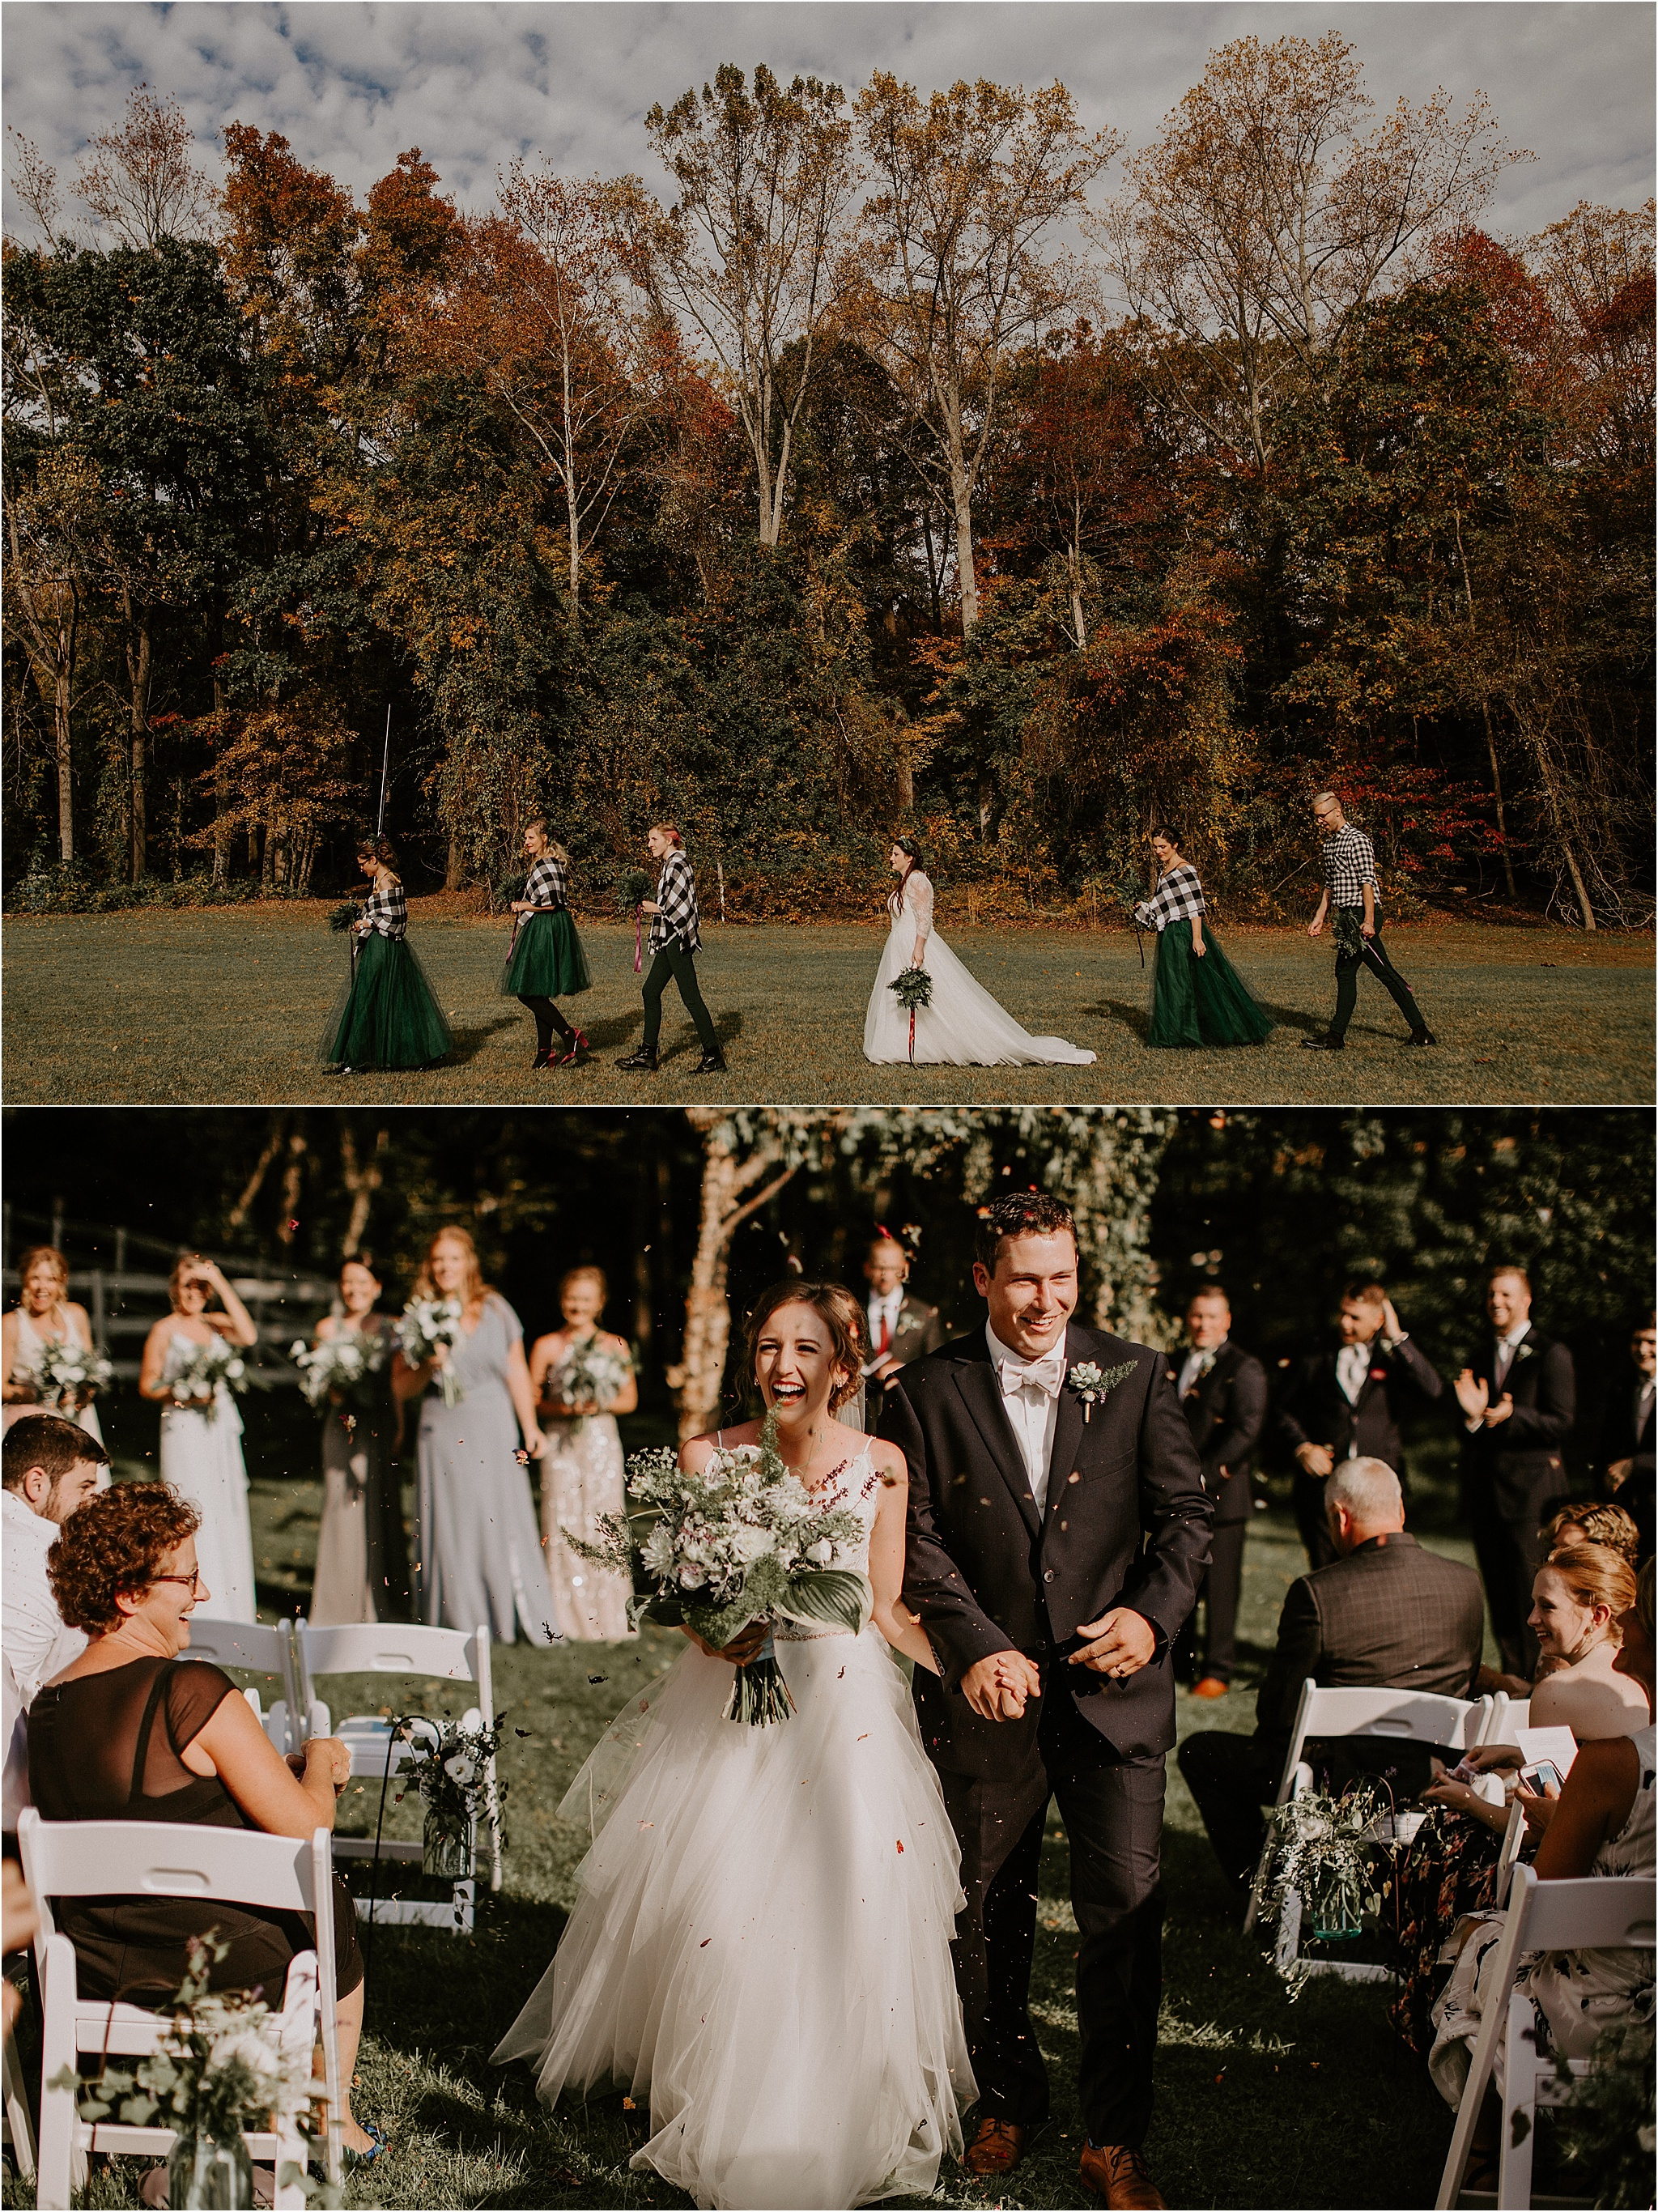 Sarah_Brookhart_Baltimore_Philly_Wedding_Photographer_0009.jpg